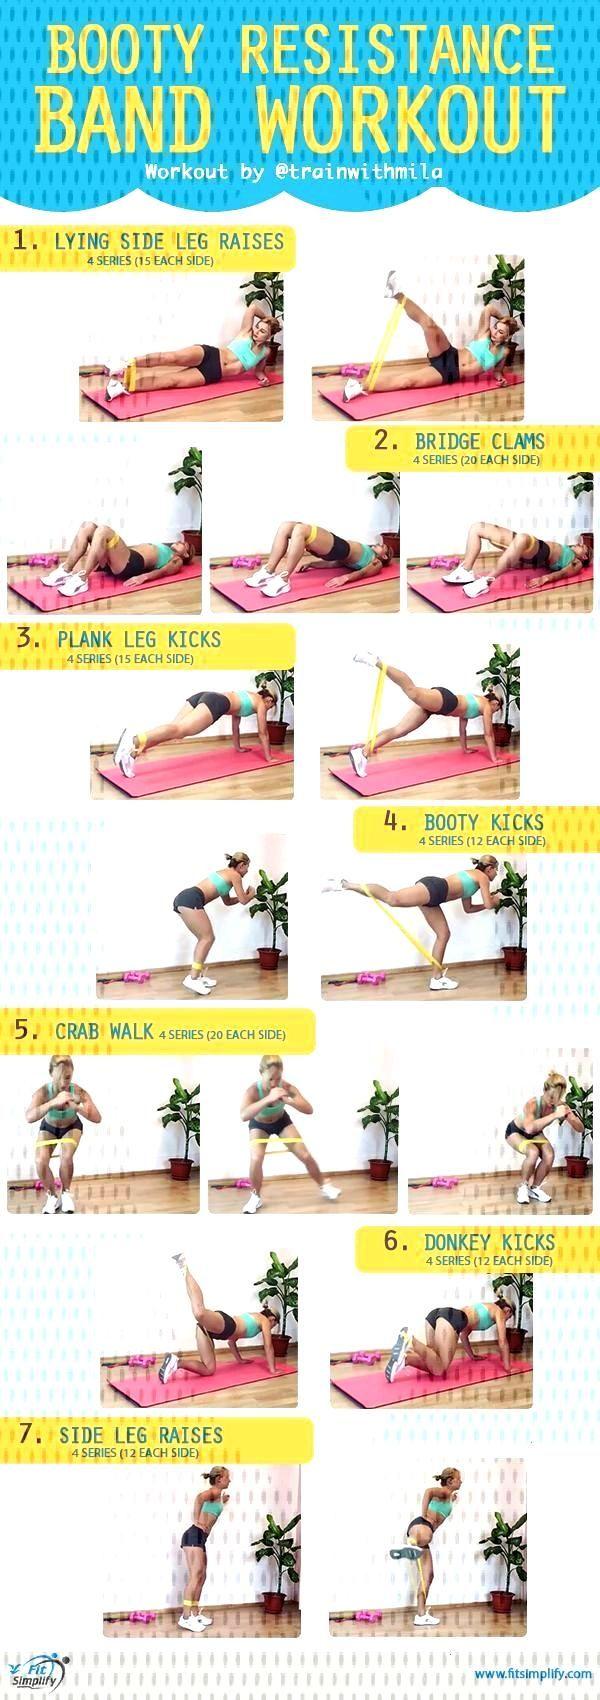 #resistancebands #weighttraining #exercisebands #fitsimplify #training #fitness #gesäß #gesund #fitf...